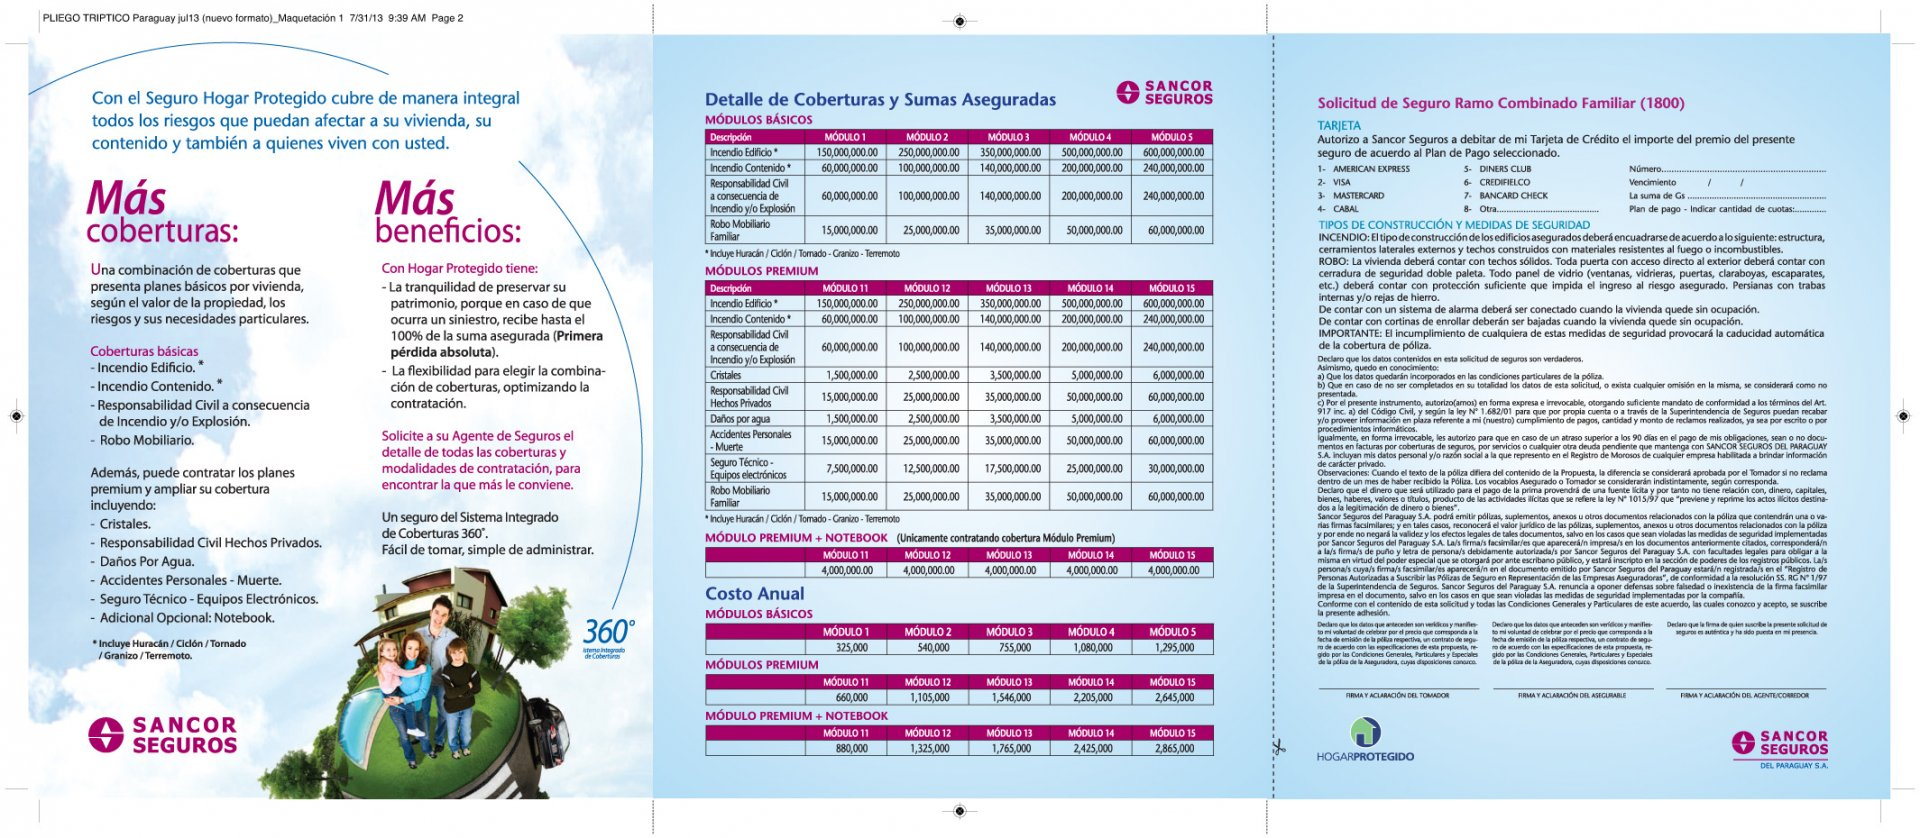 PLIEGO TRIPTICO Paraguay jul13 (nuevo formato) (2).jpg